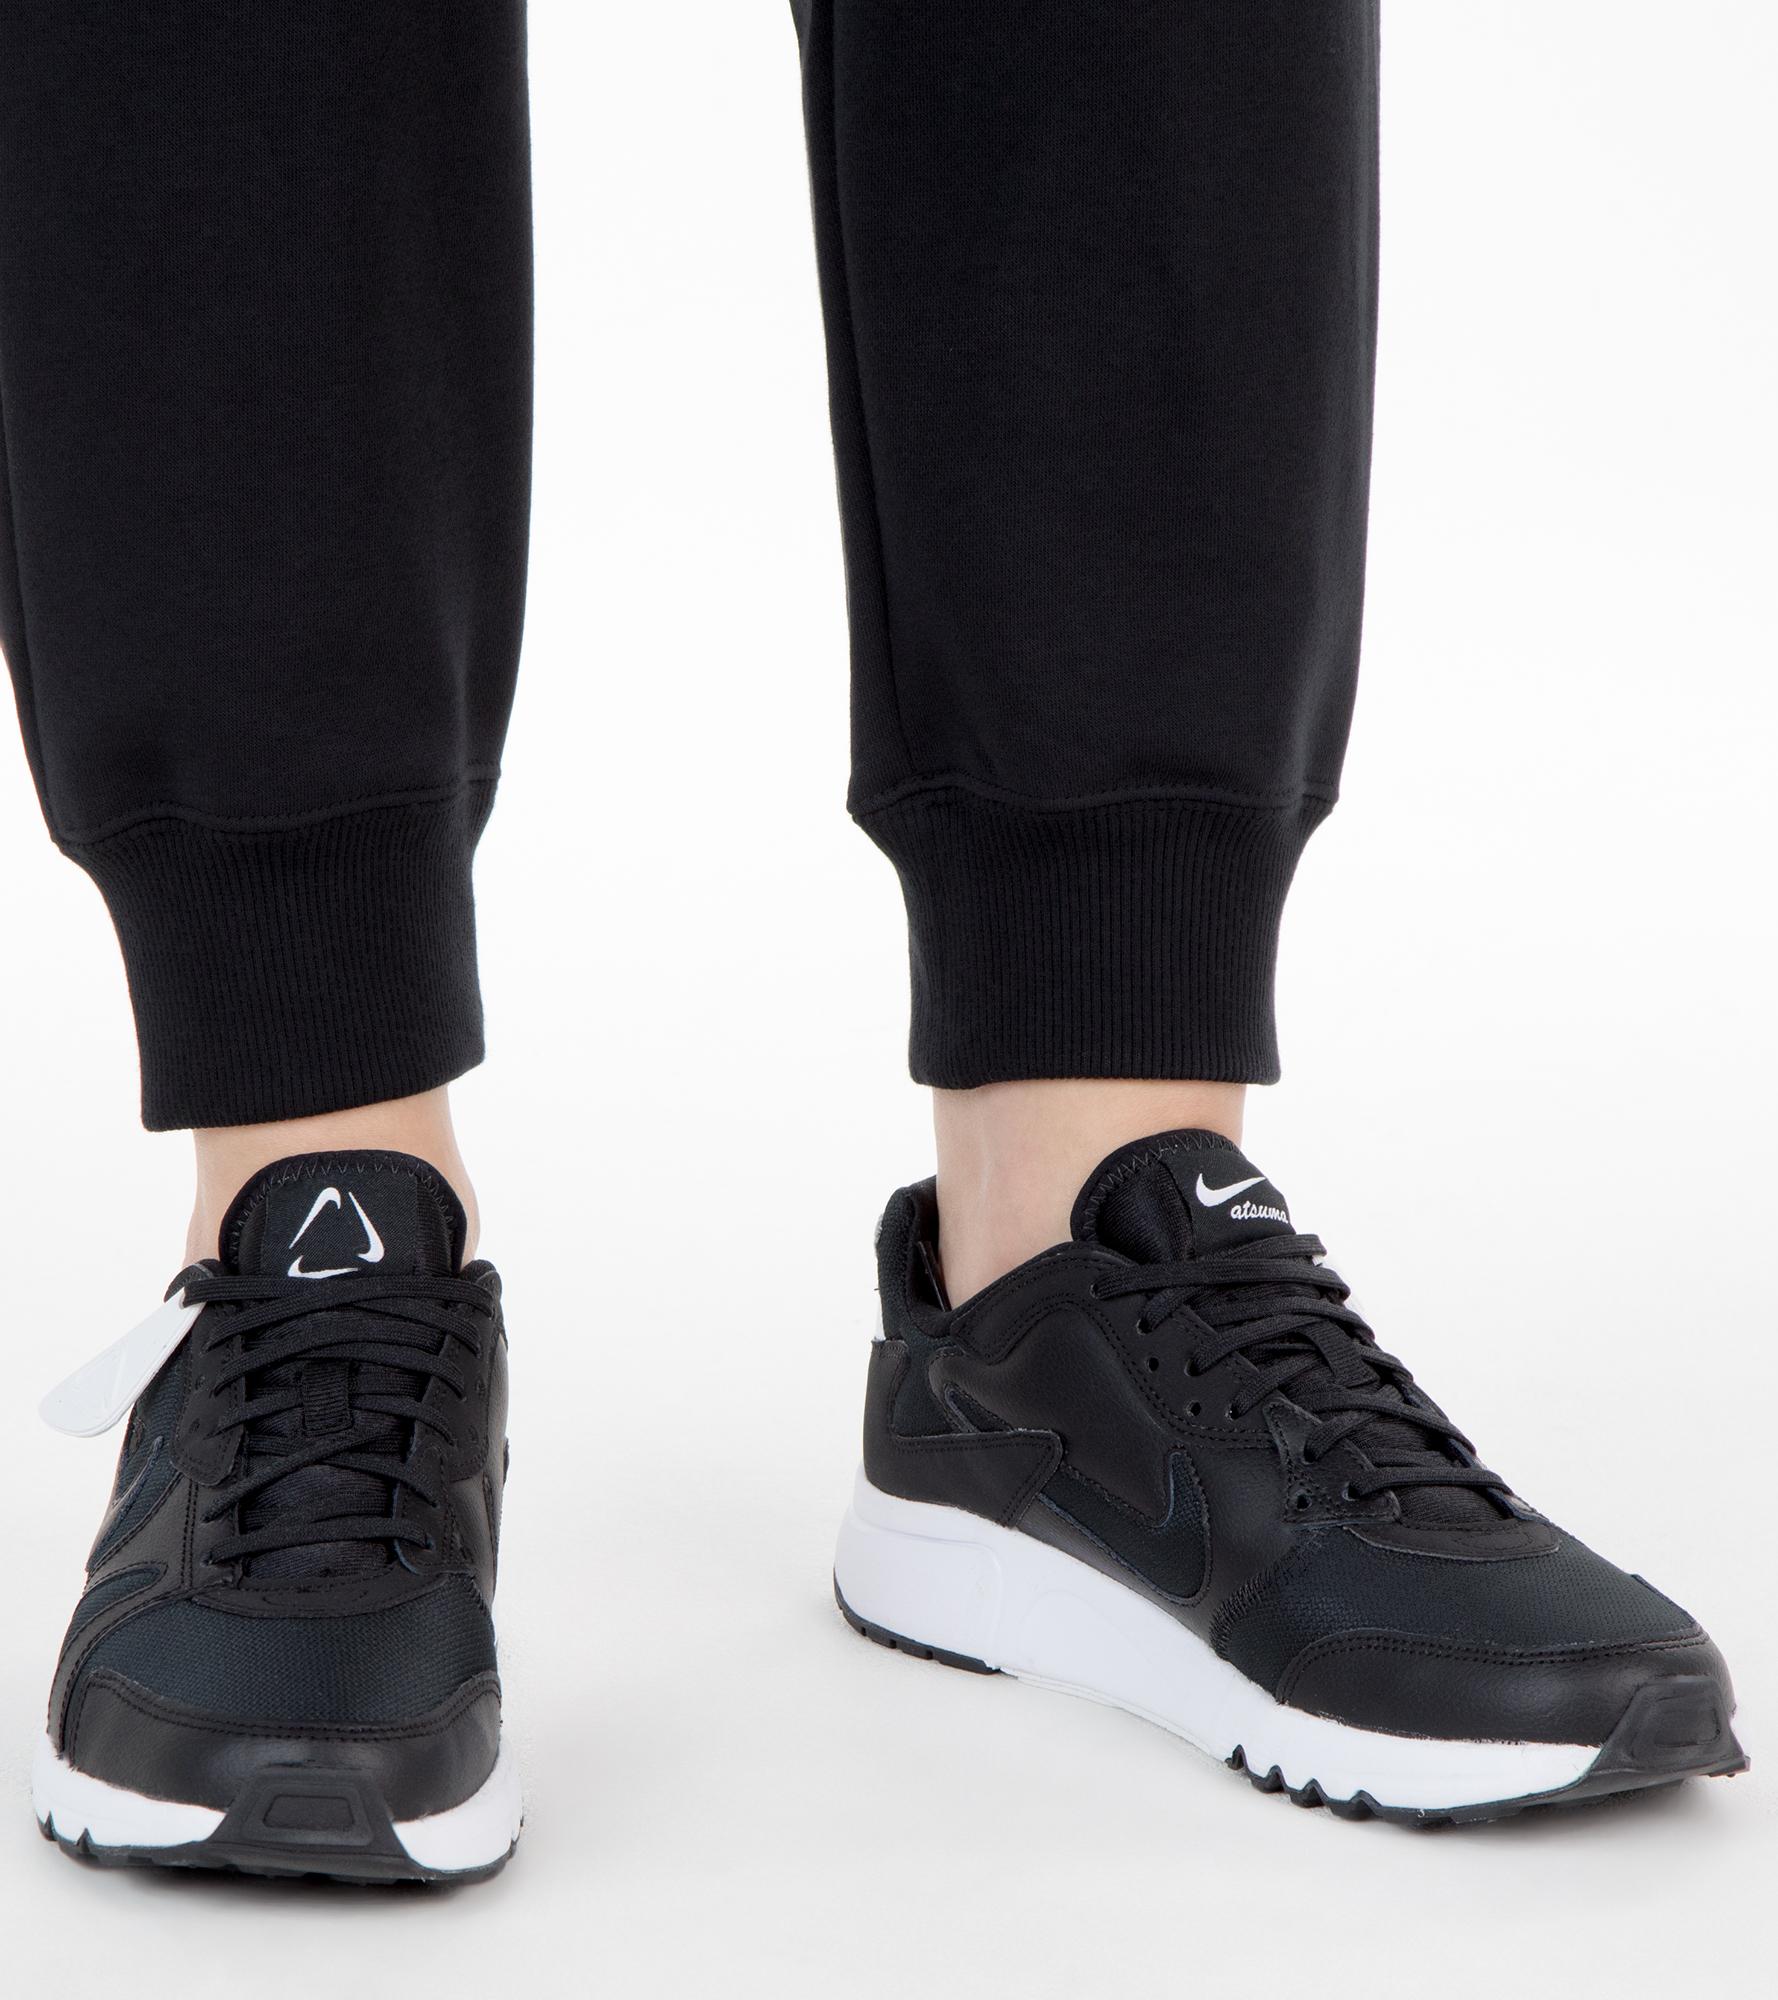 Nike Кроссовки женские Nike Atsuma, размер 37